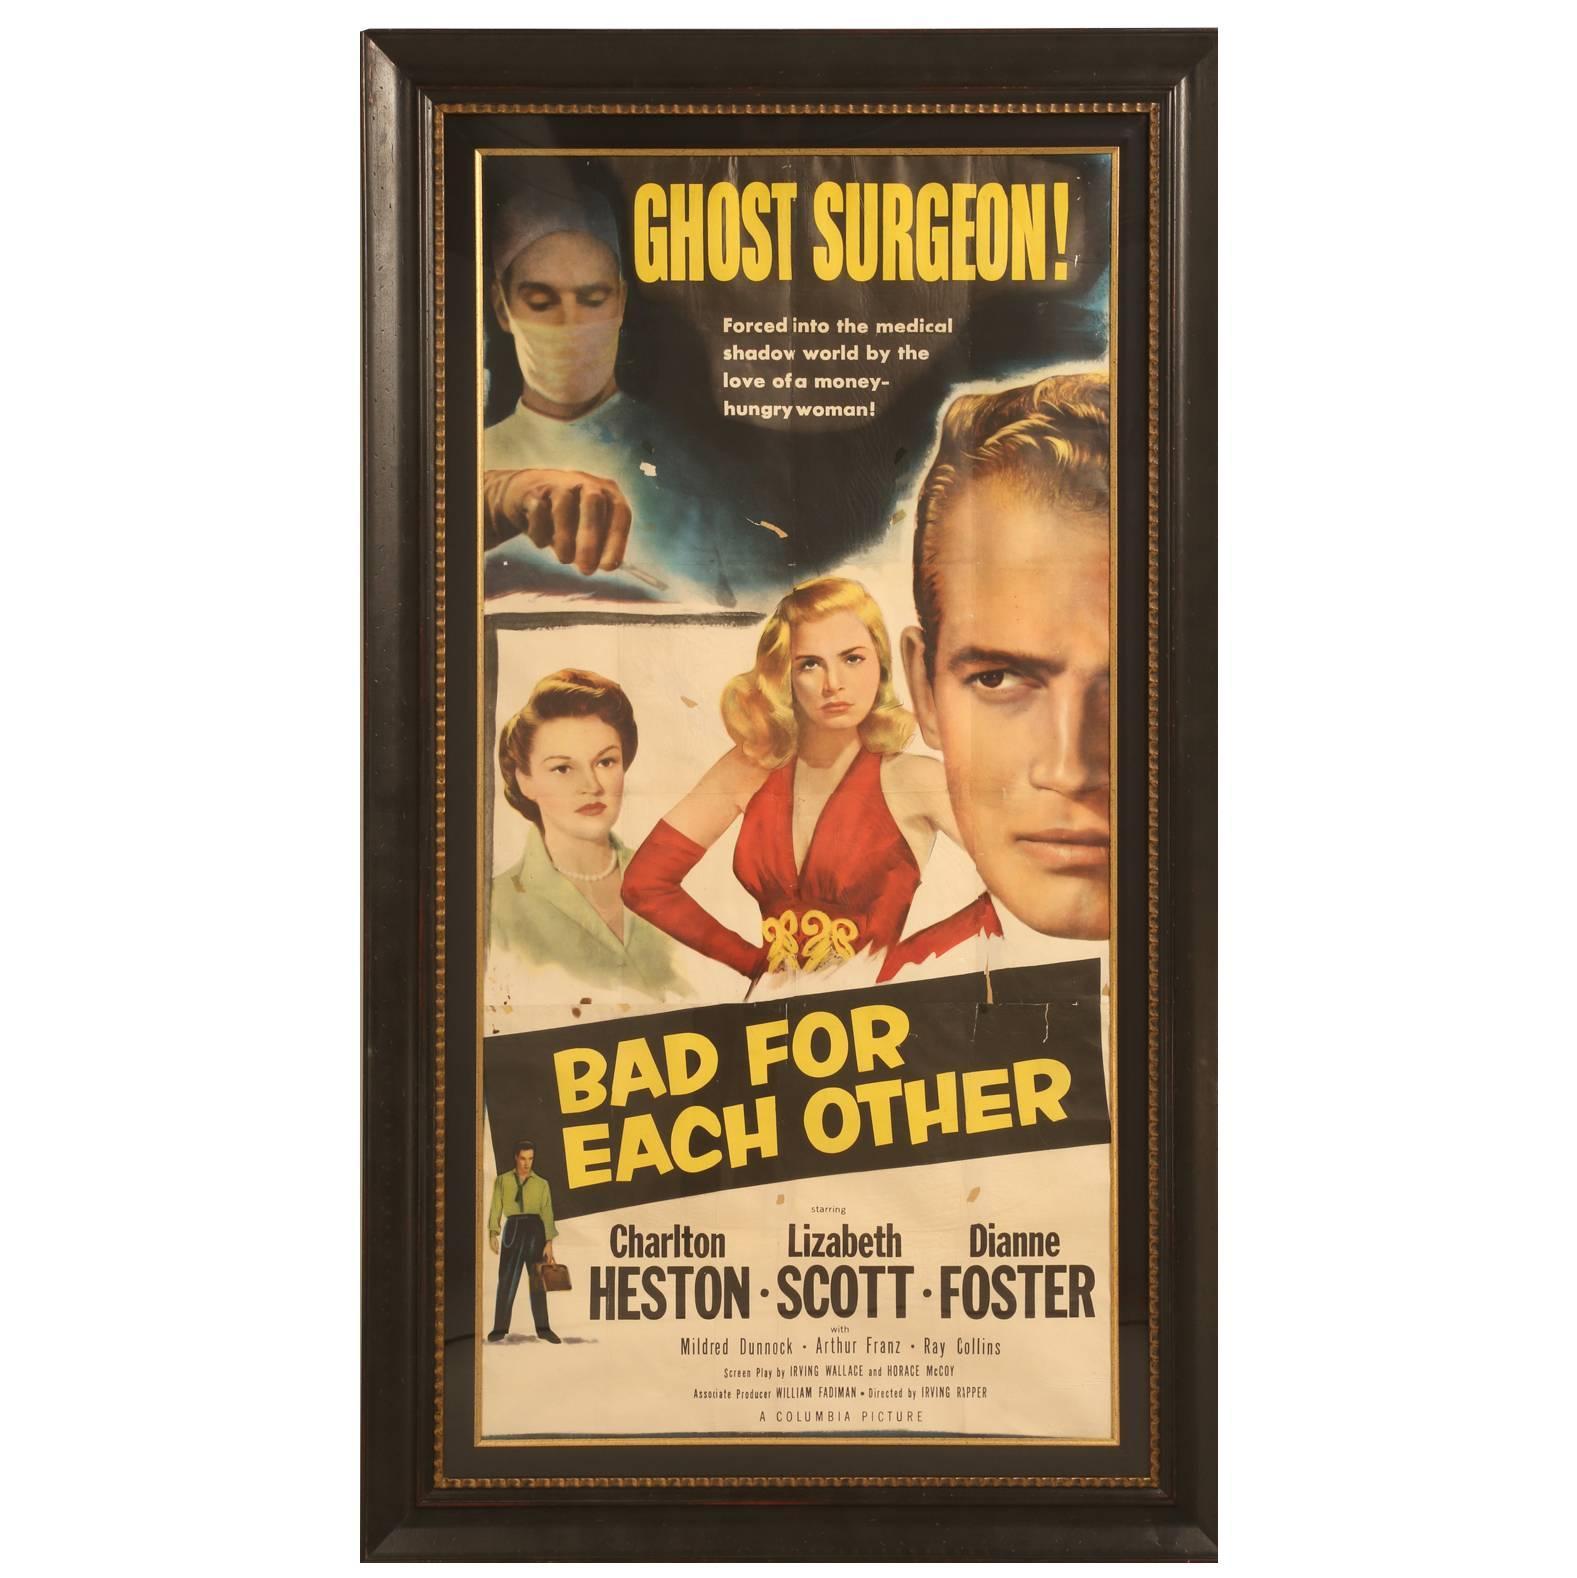 Movie Poster with Charlton Heston, circa 1953